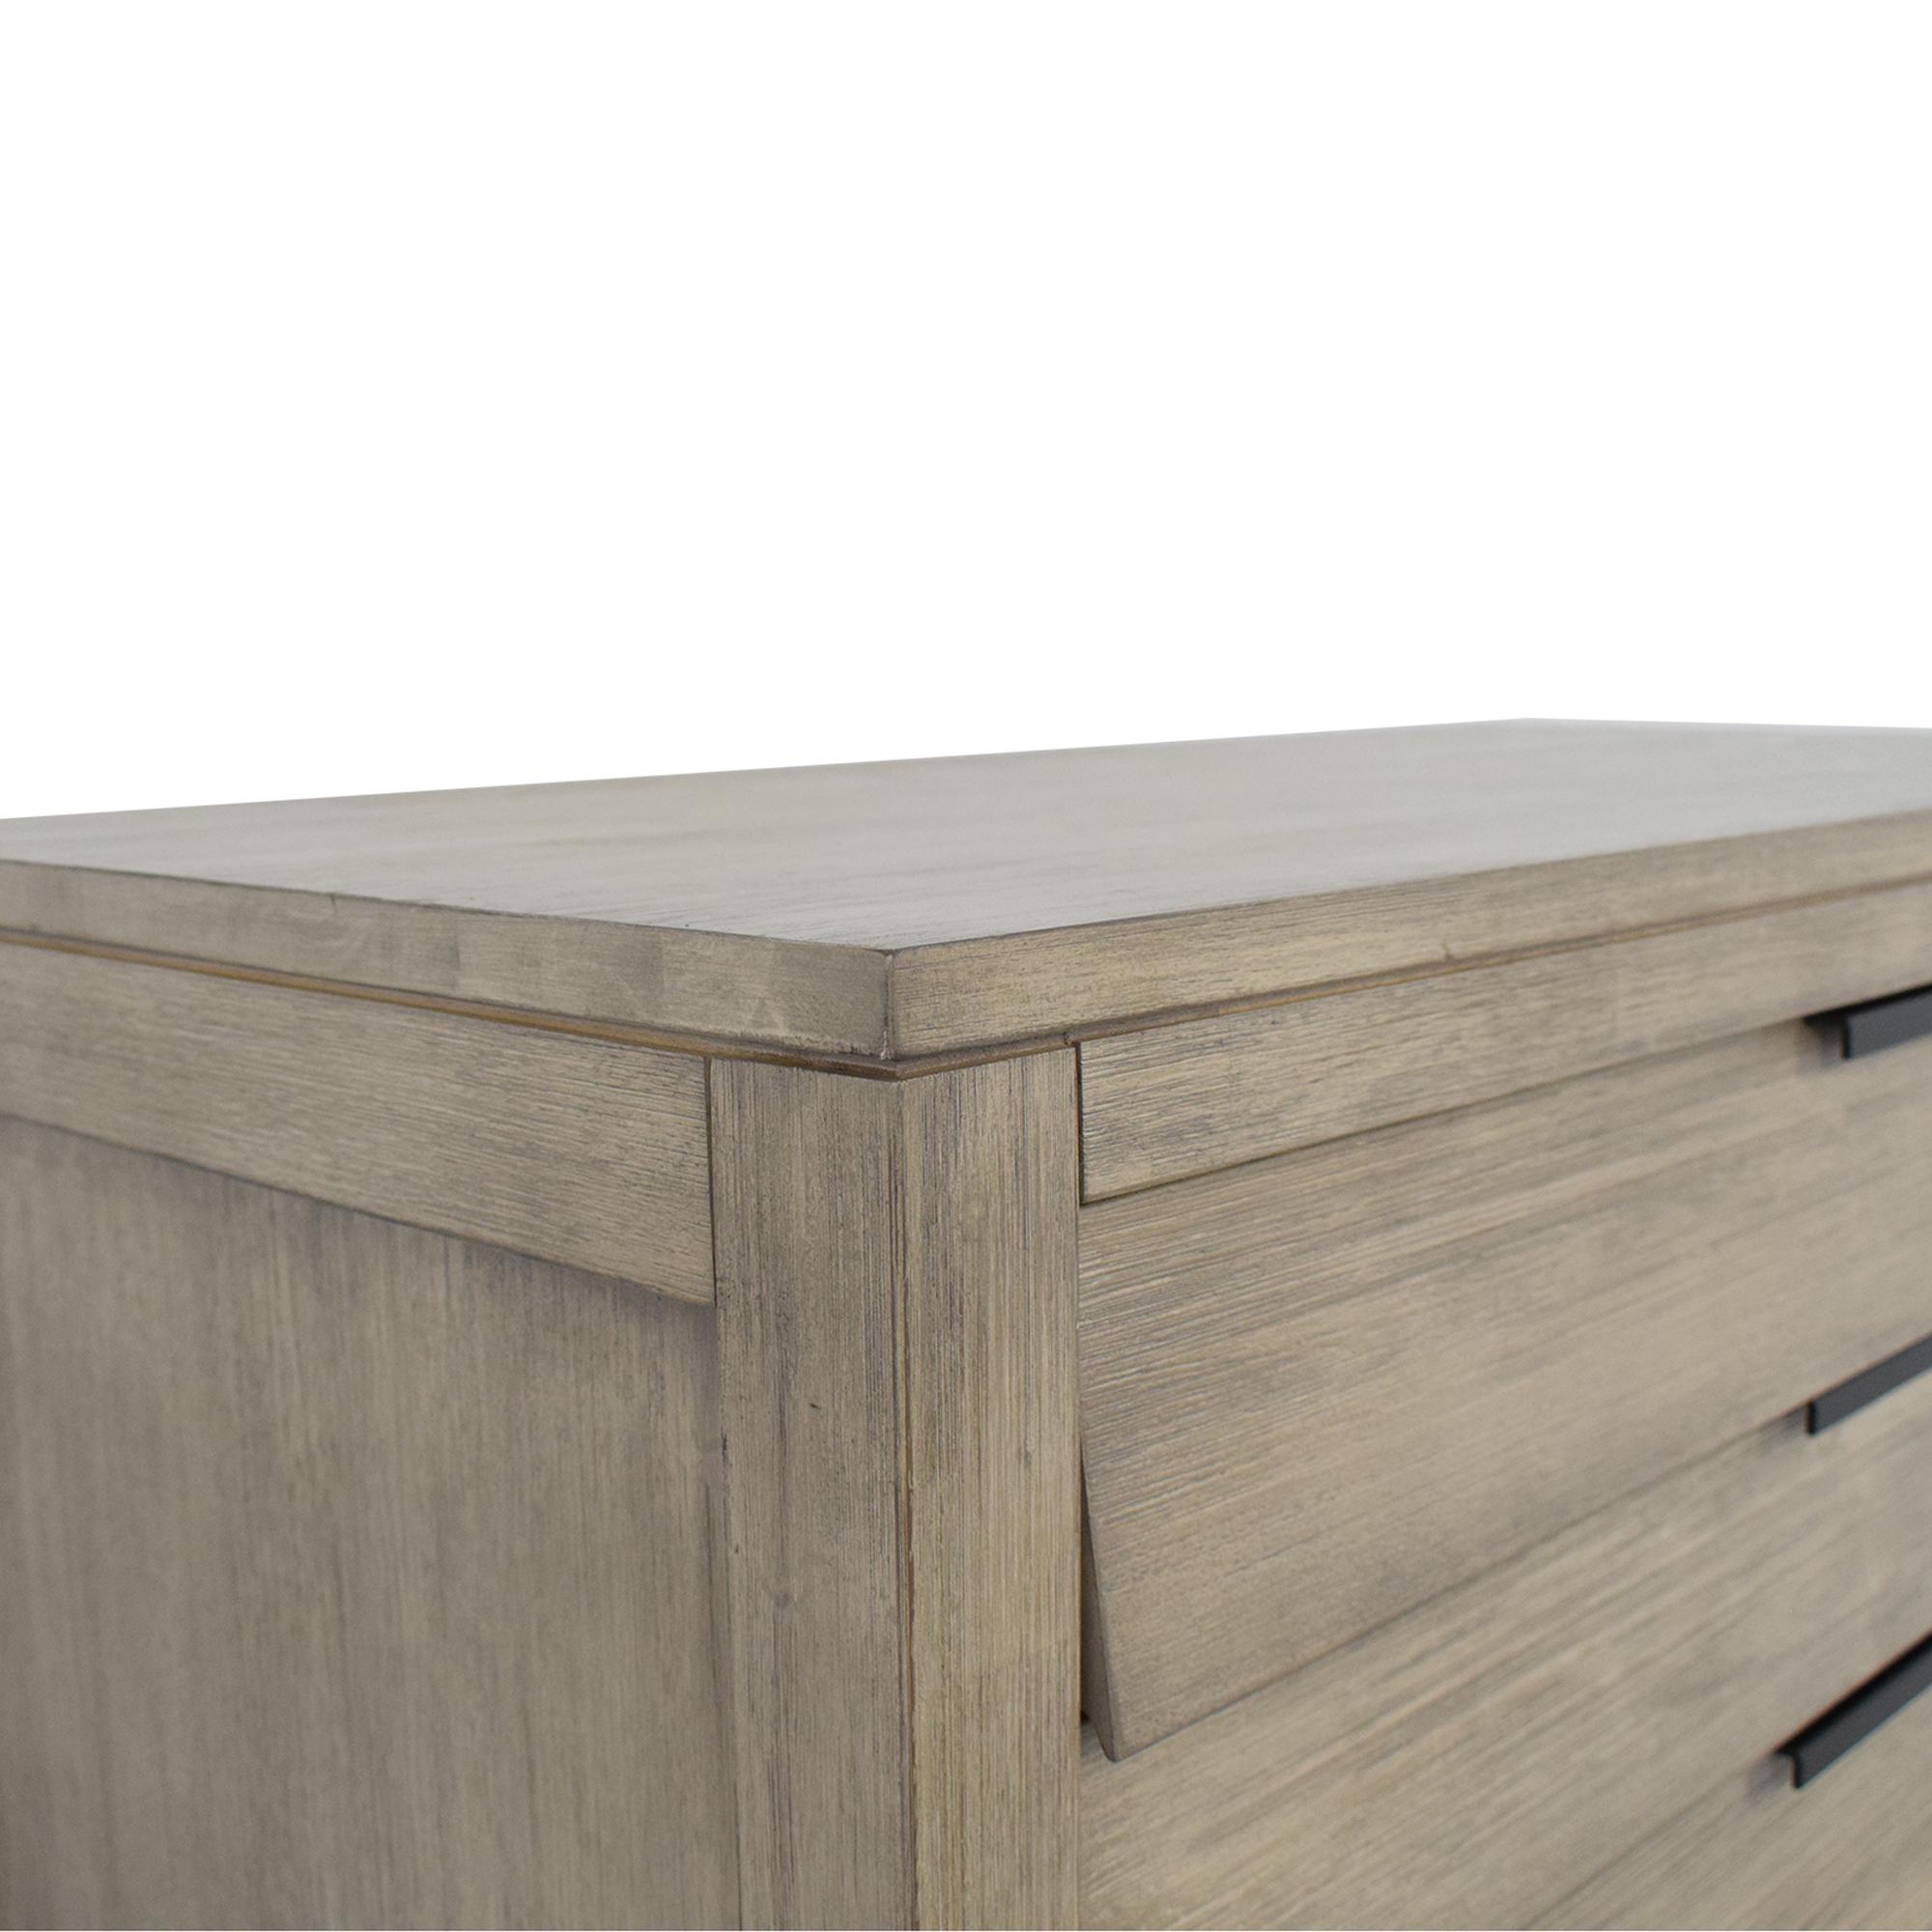 Cresent Furniture Cresent 6 Drawer Chest nj